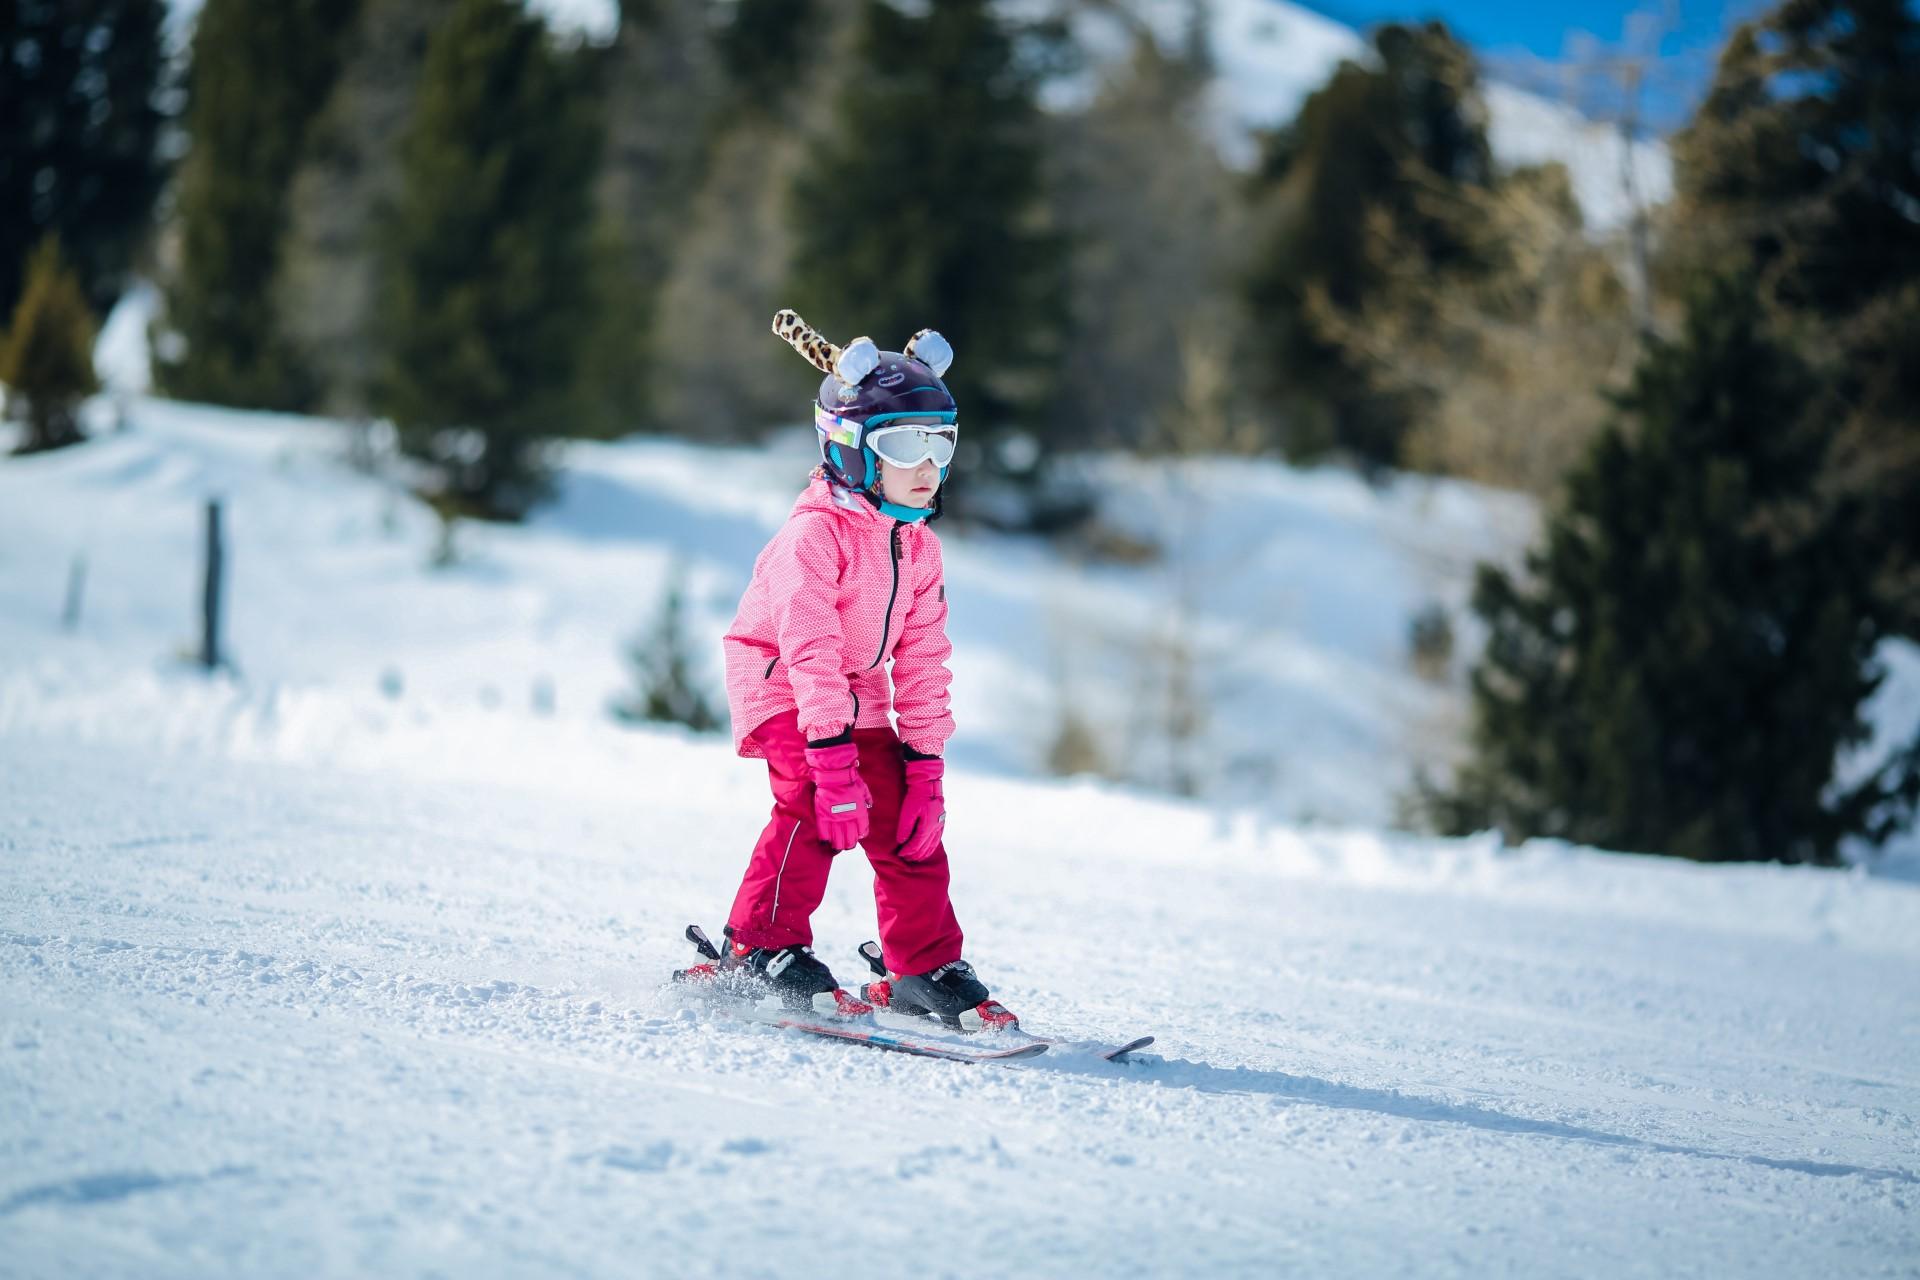 sport-invernali-hotel-bucaneve (1)